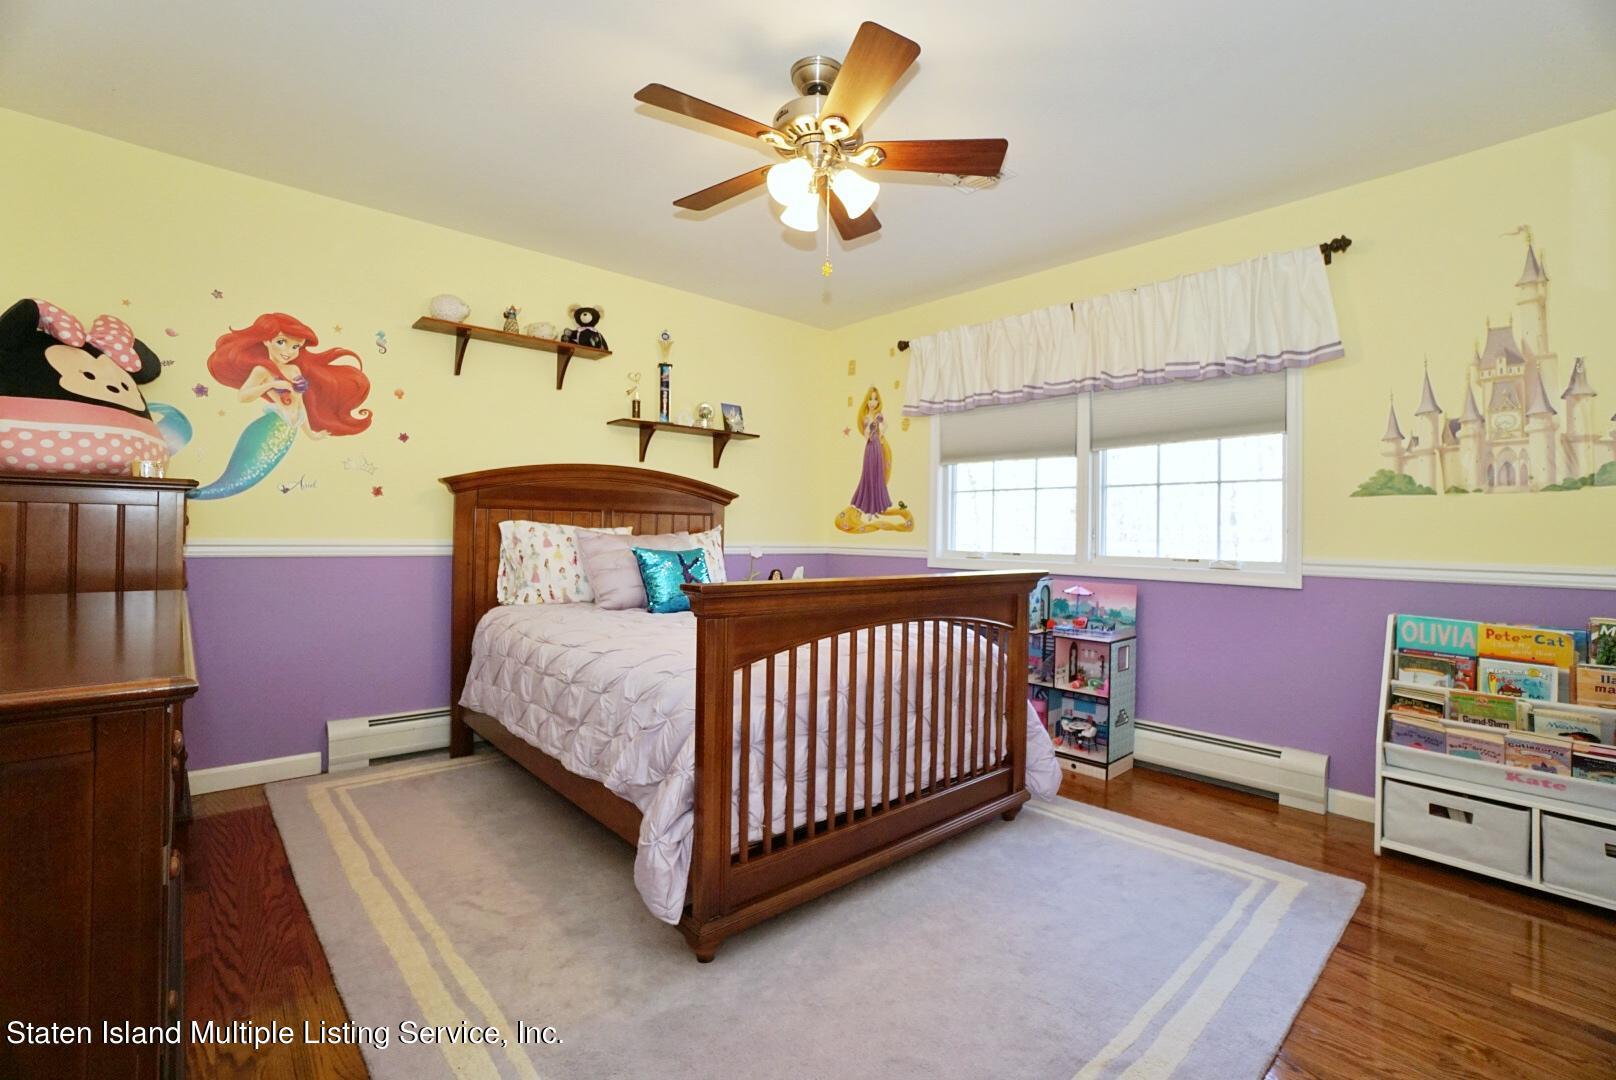 Single Family - Detached 31 Belwood Loop  Staten Island, NY 10307, MLS-1143133-46